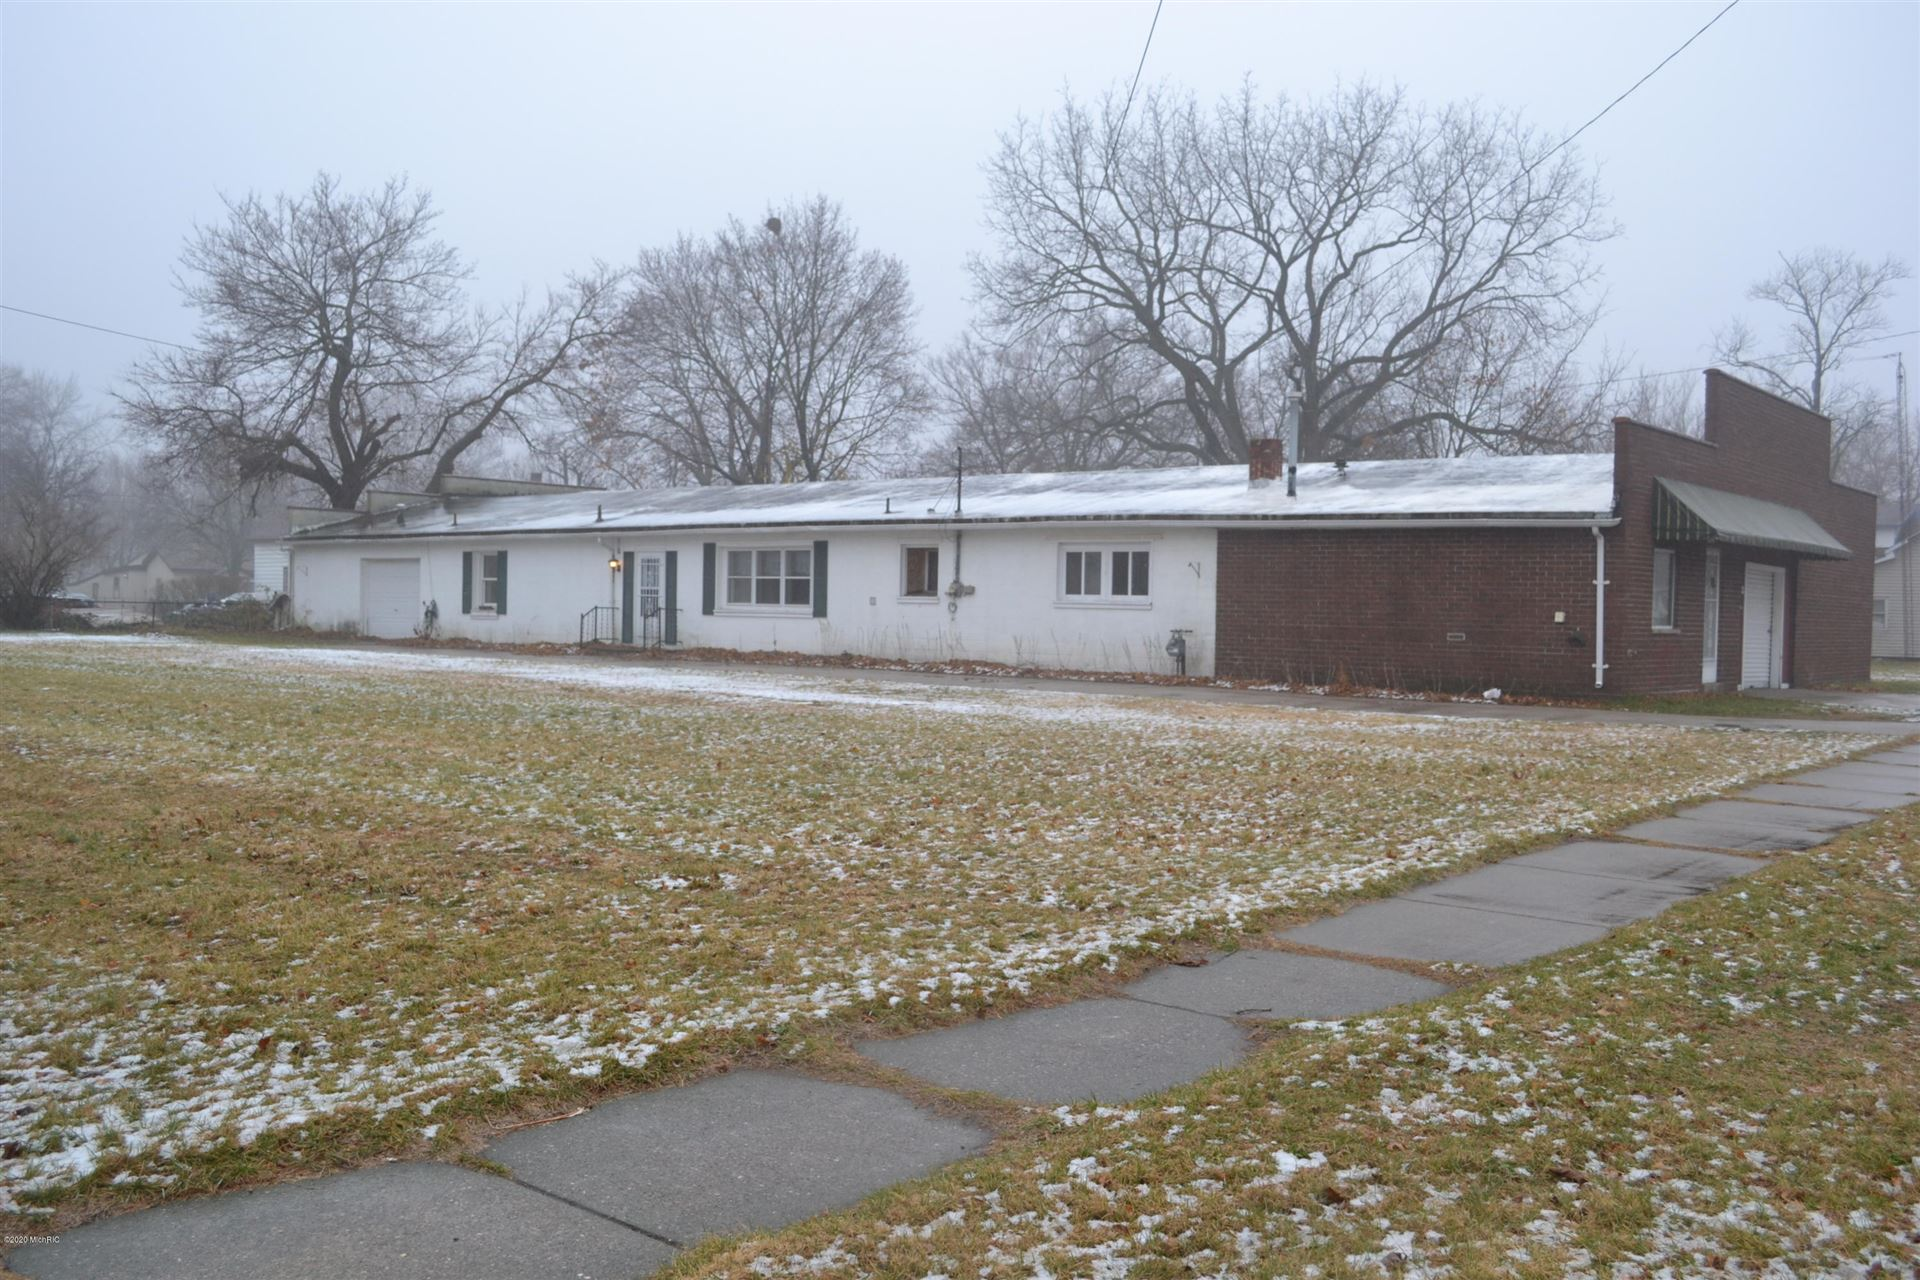 Photo of 283 Iona Avenue, Muskegon, MI 49442 (MLS # 20048899)